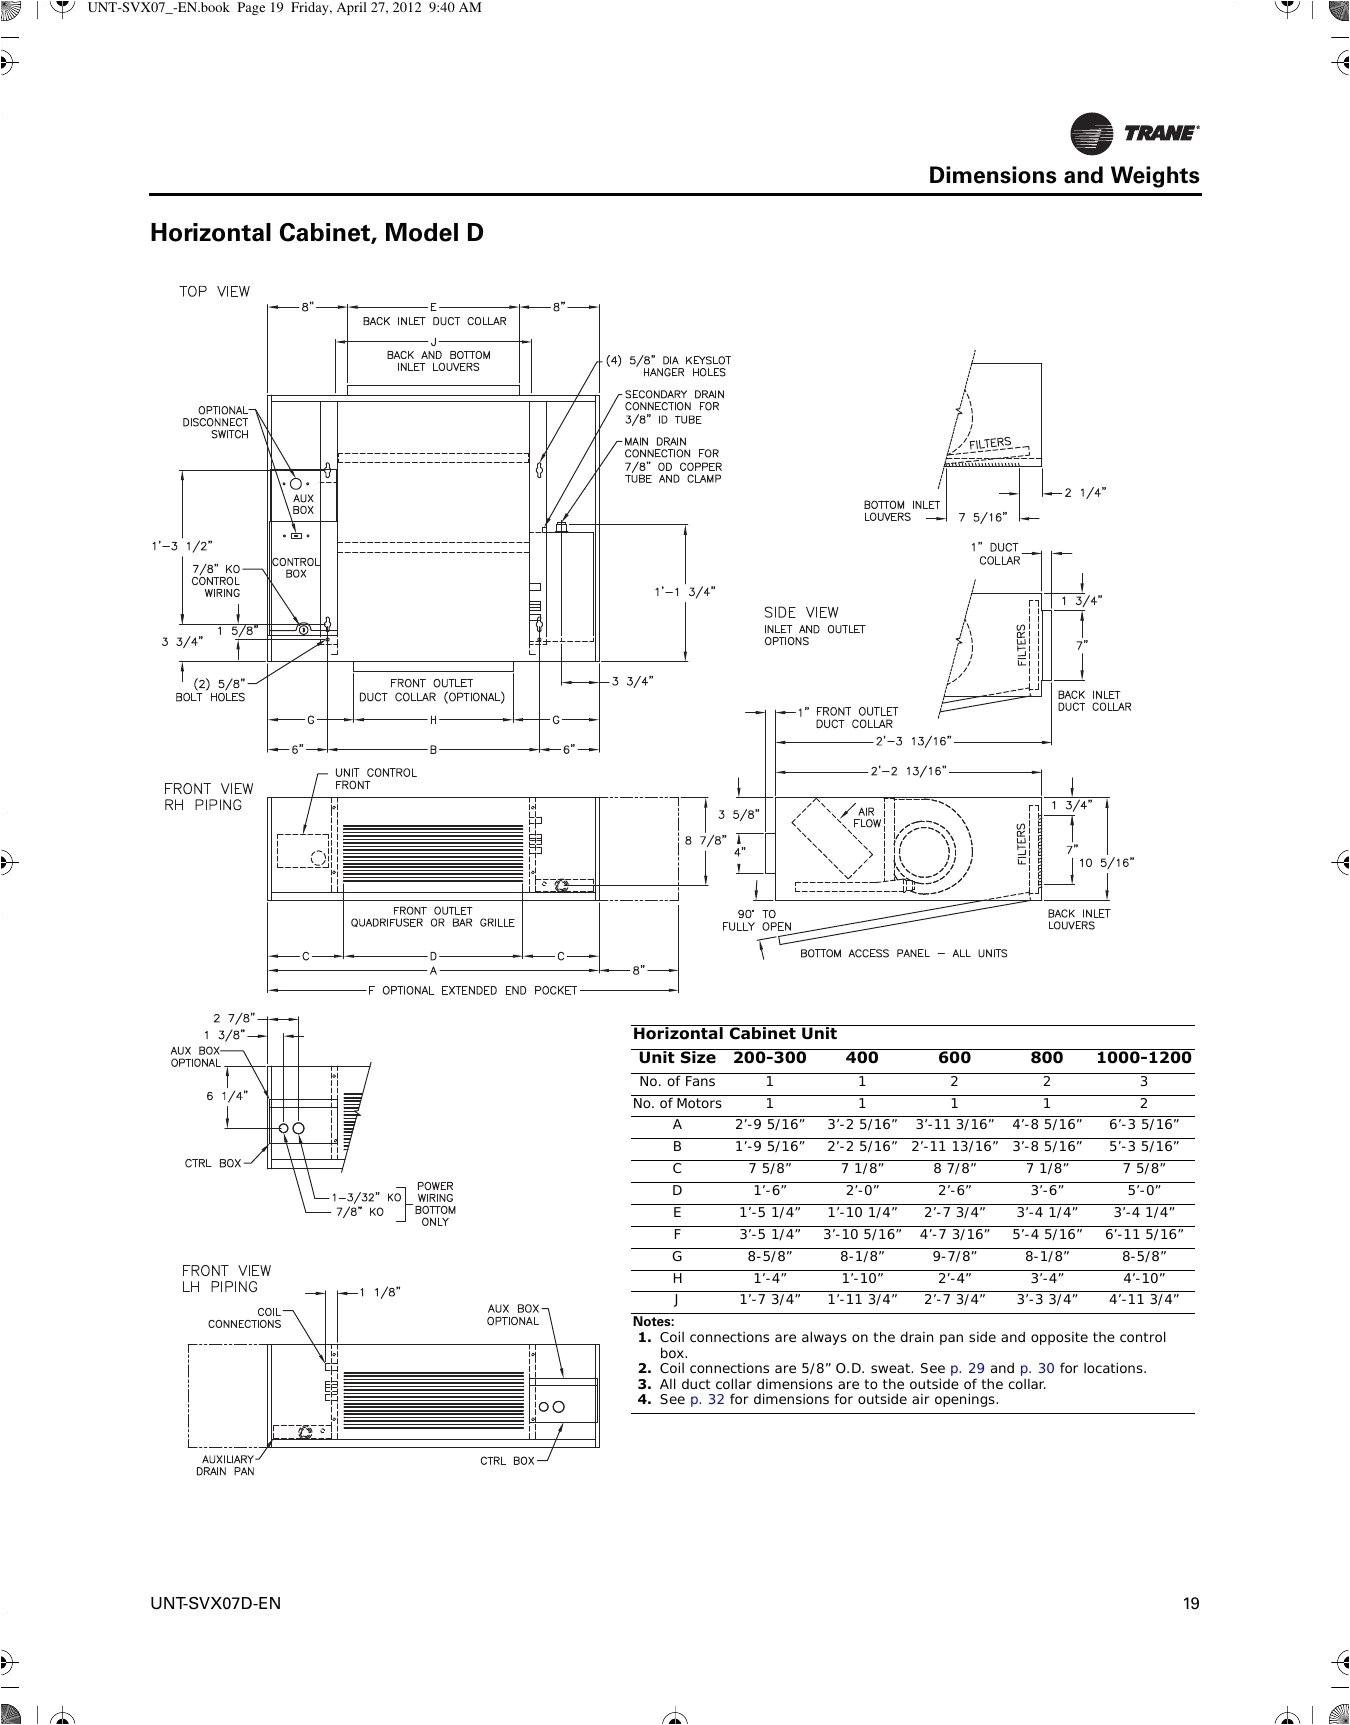 trane wiring diagram heat pump hvac heater wiring diagram inspirationa inspirational trane wiring diagram heat pump 17m jpg